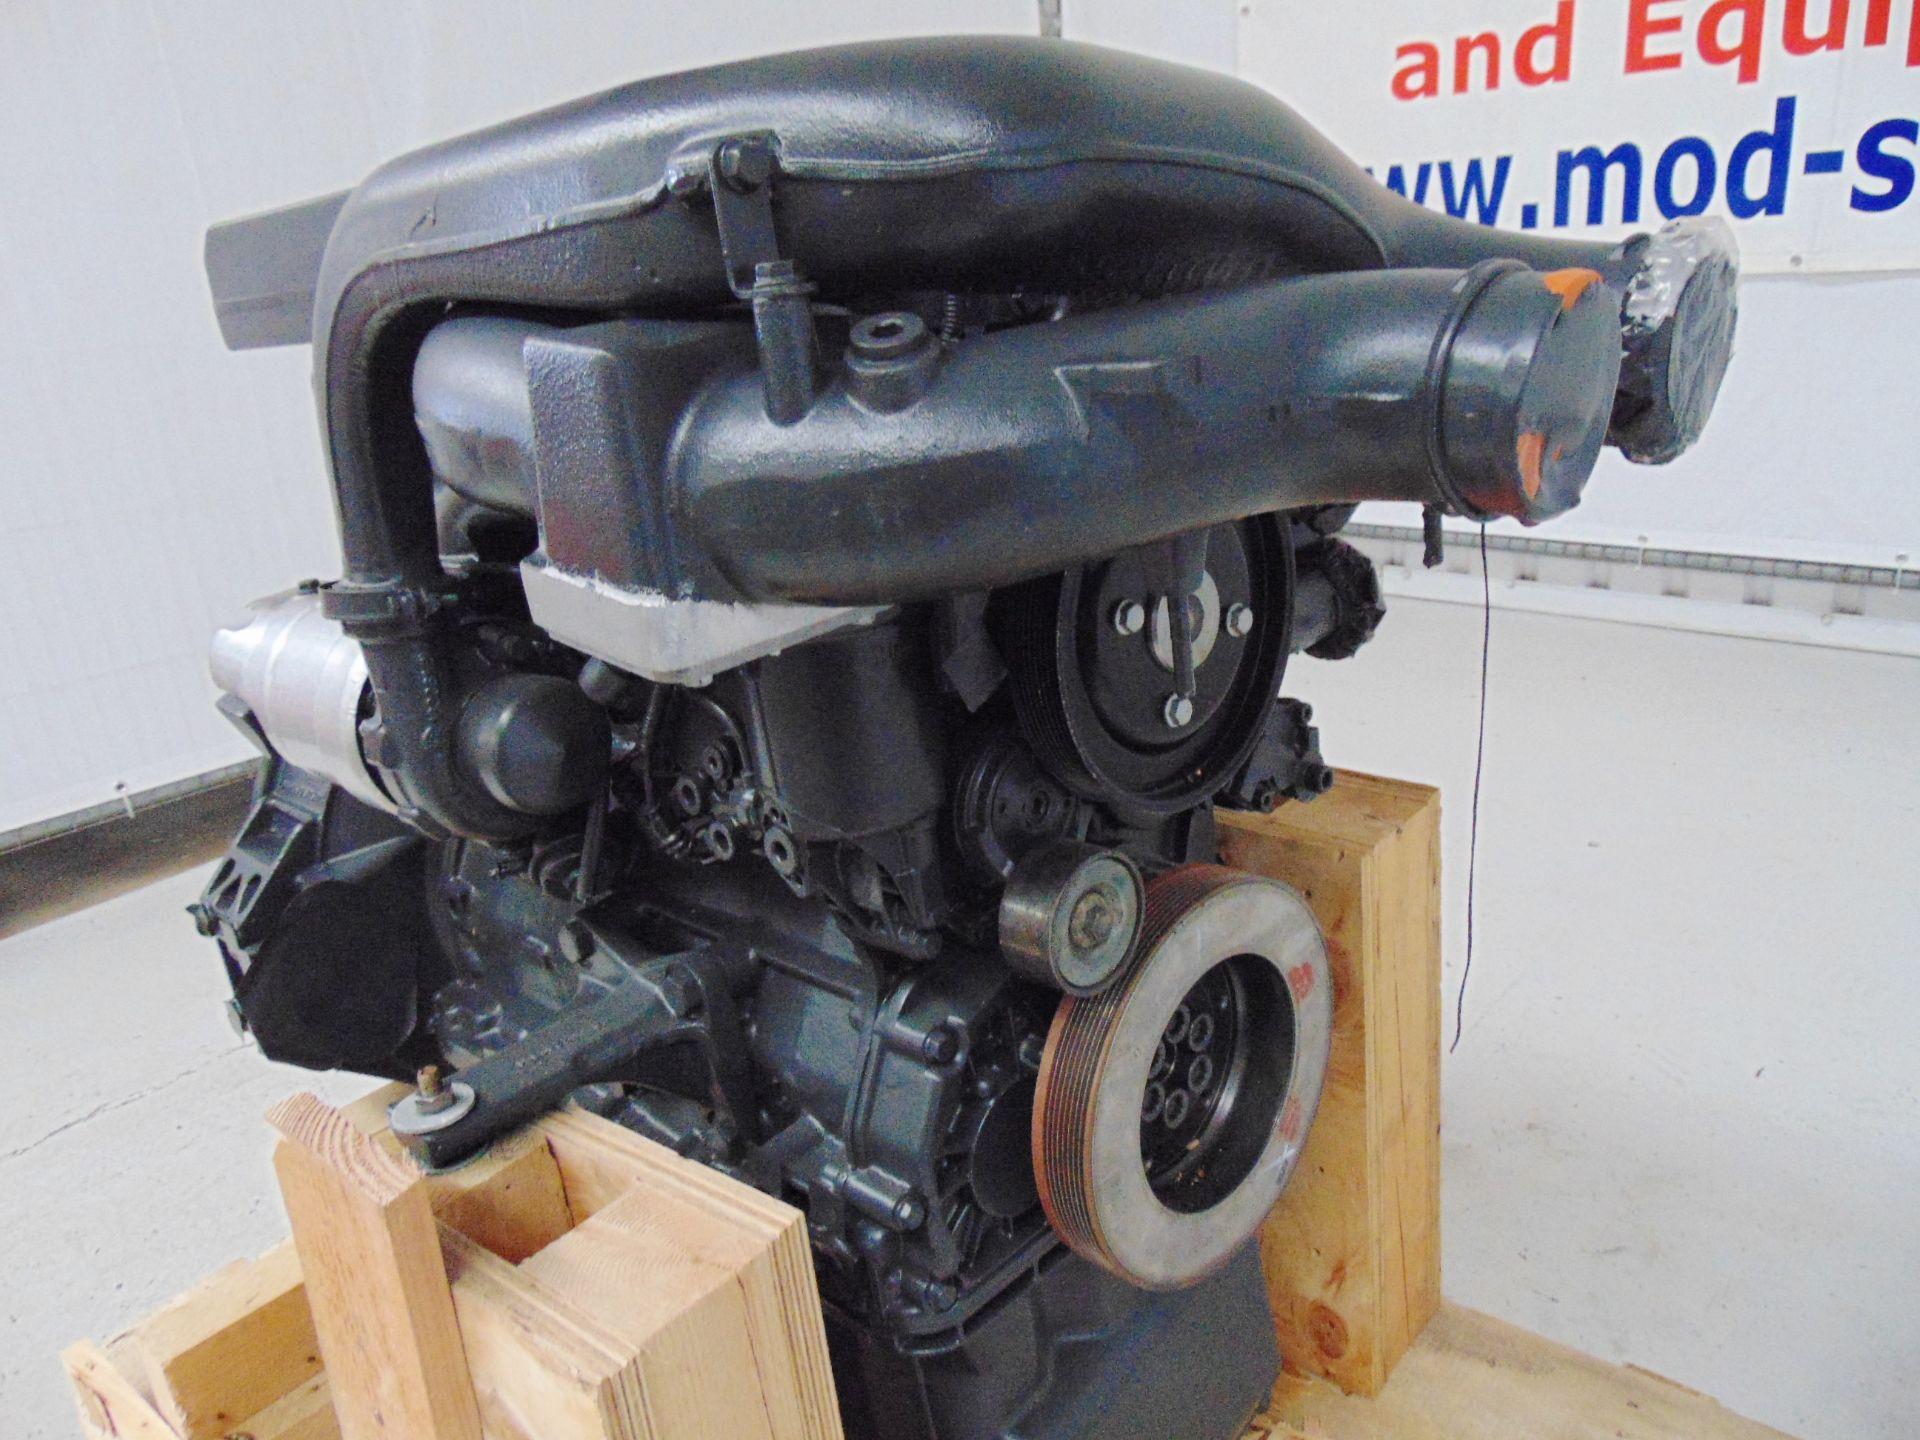 Lot 3 - Brand New & Unused Mercedes-Benz OM904LA Turbo Diesel Engine